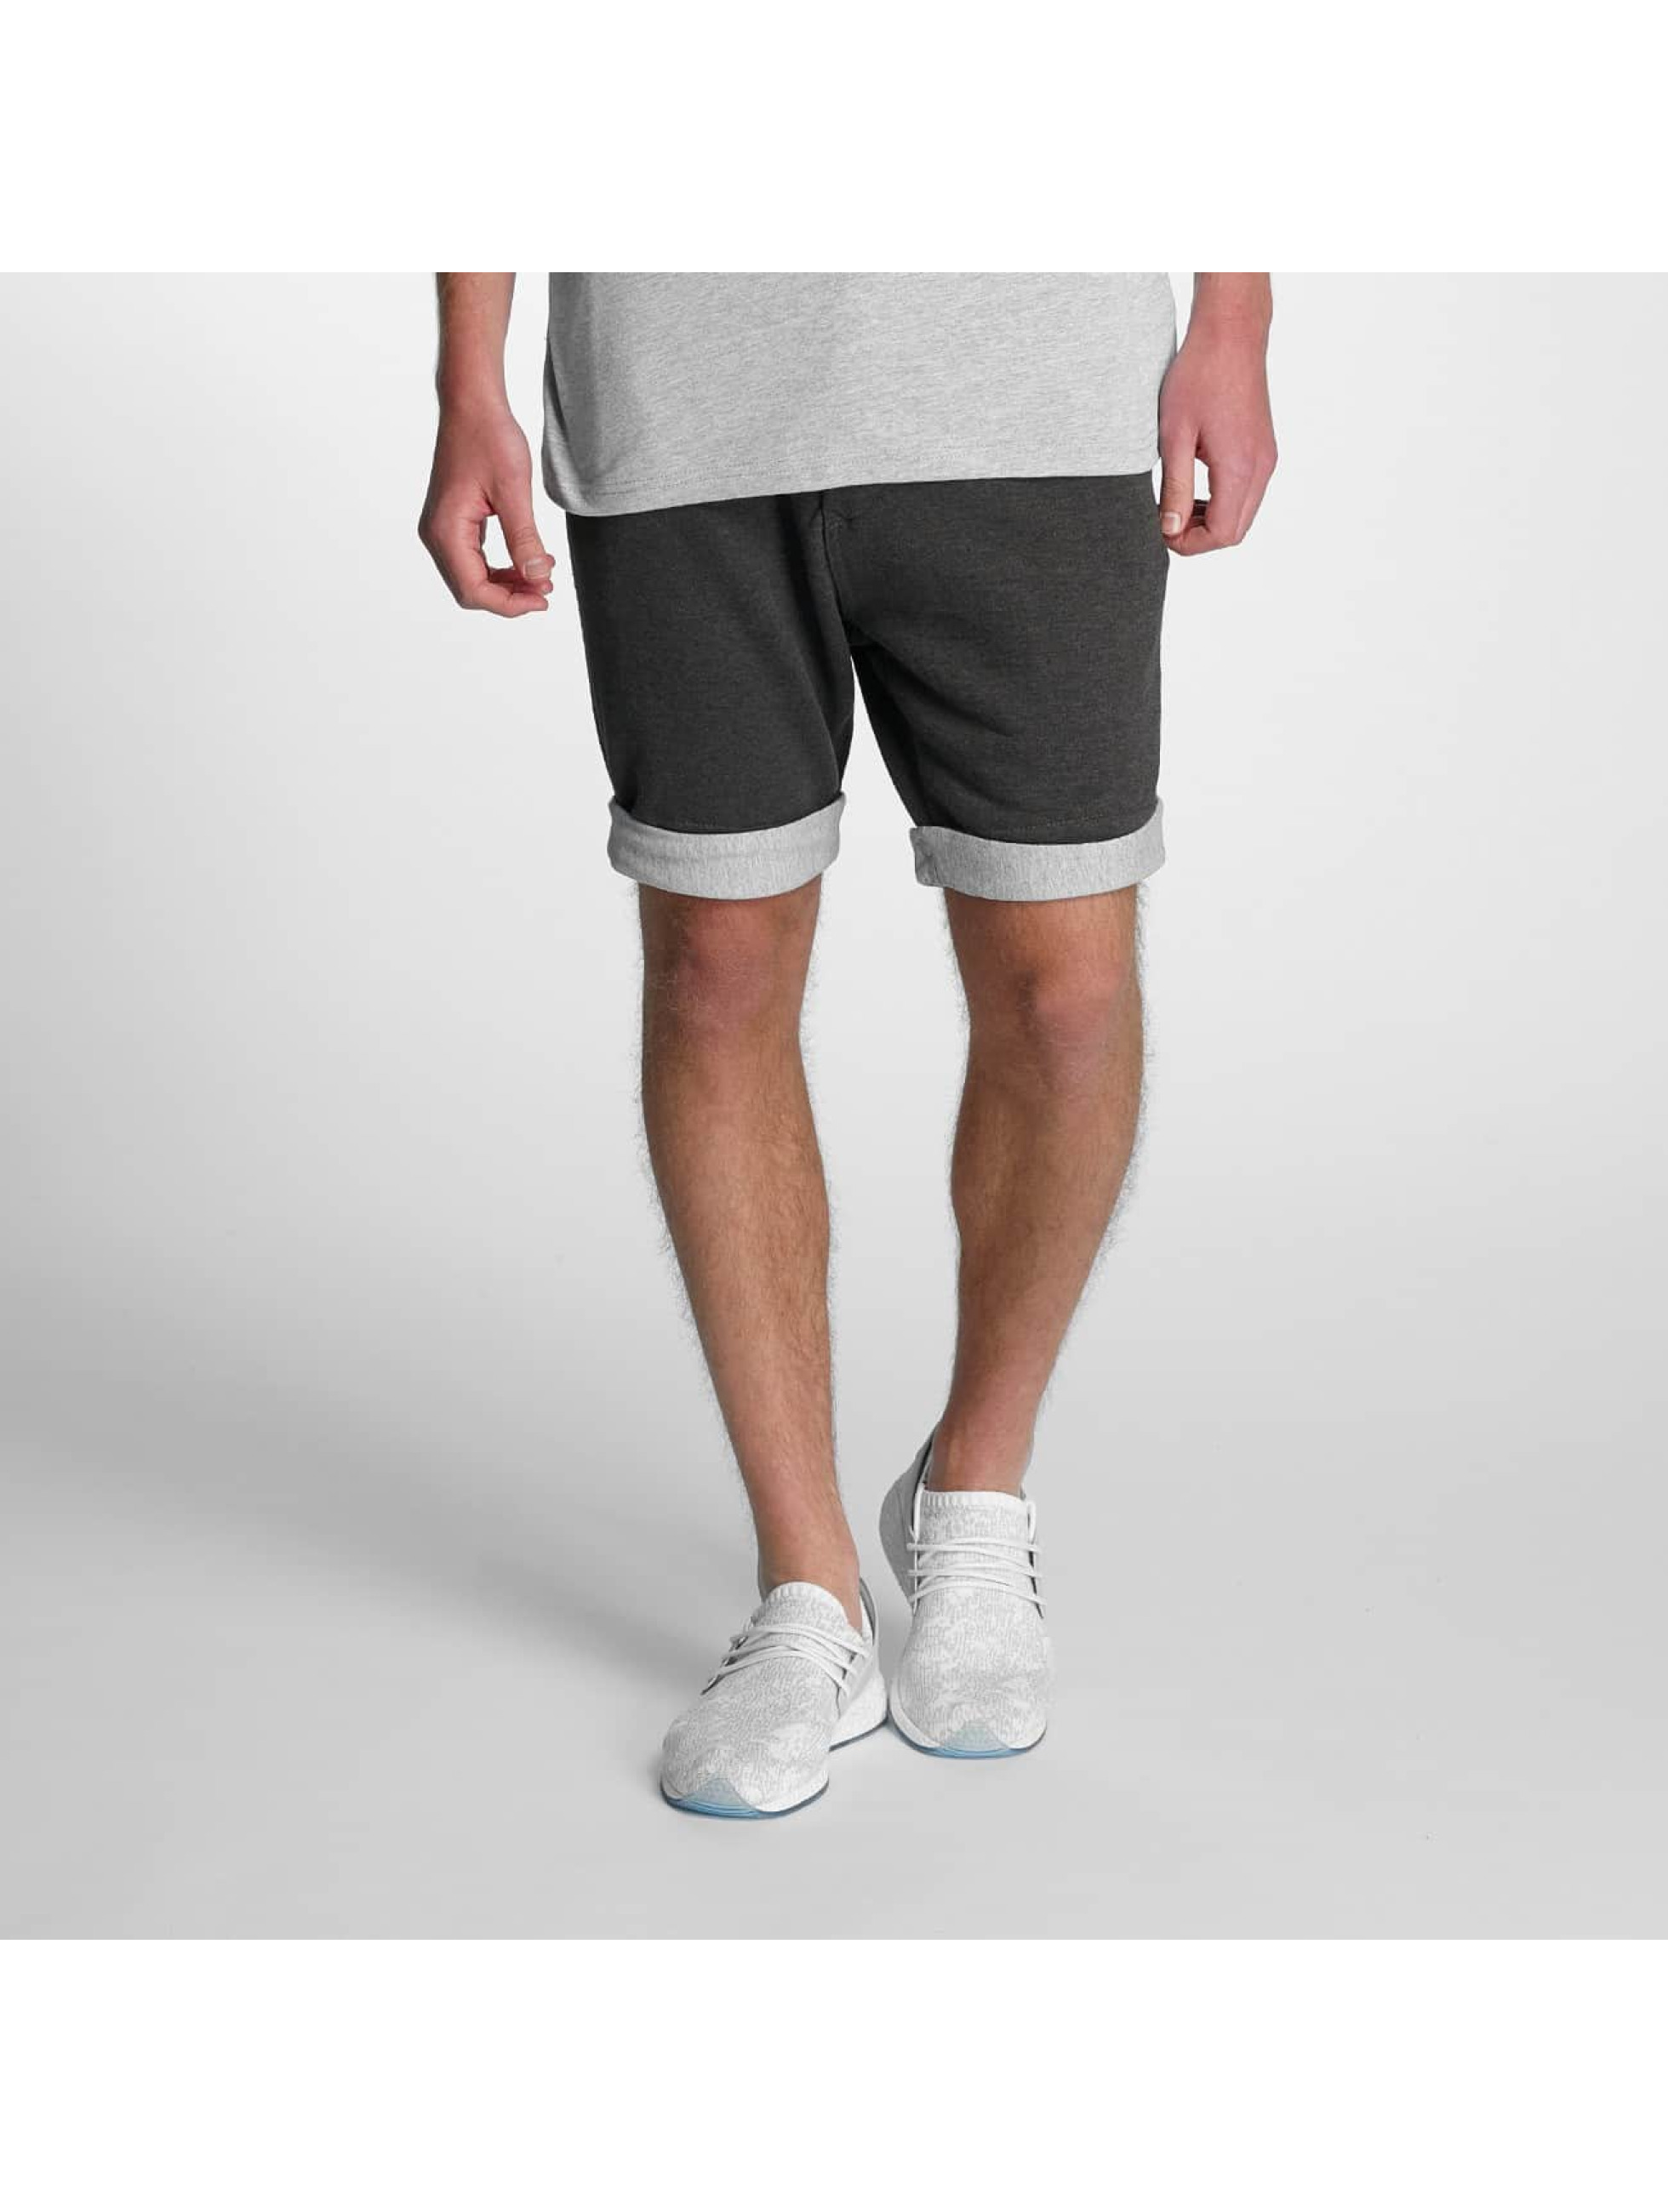 Just Rhyse Pantalon / Shorts Watsonville en gris